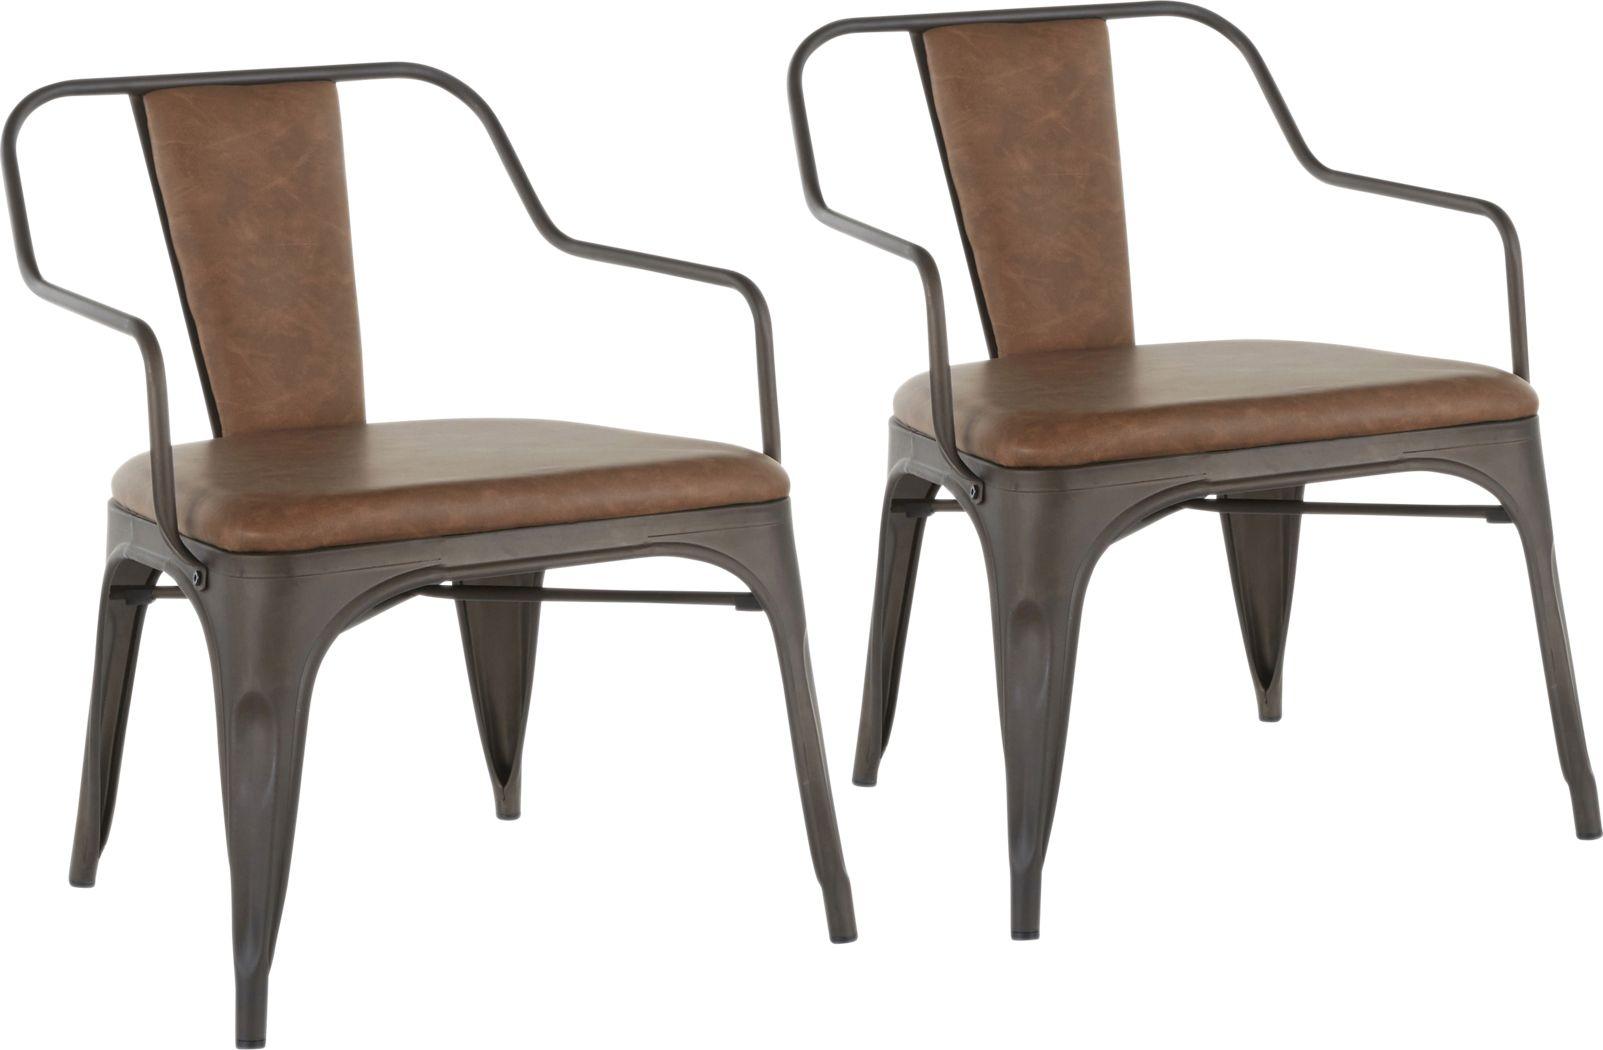 Glenfern Espresso Accent Chair, Set of 2